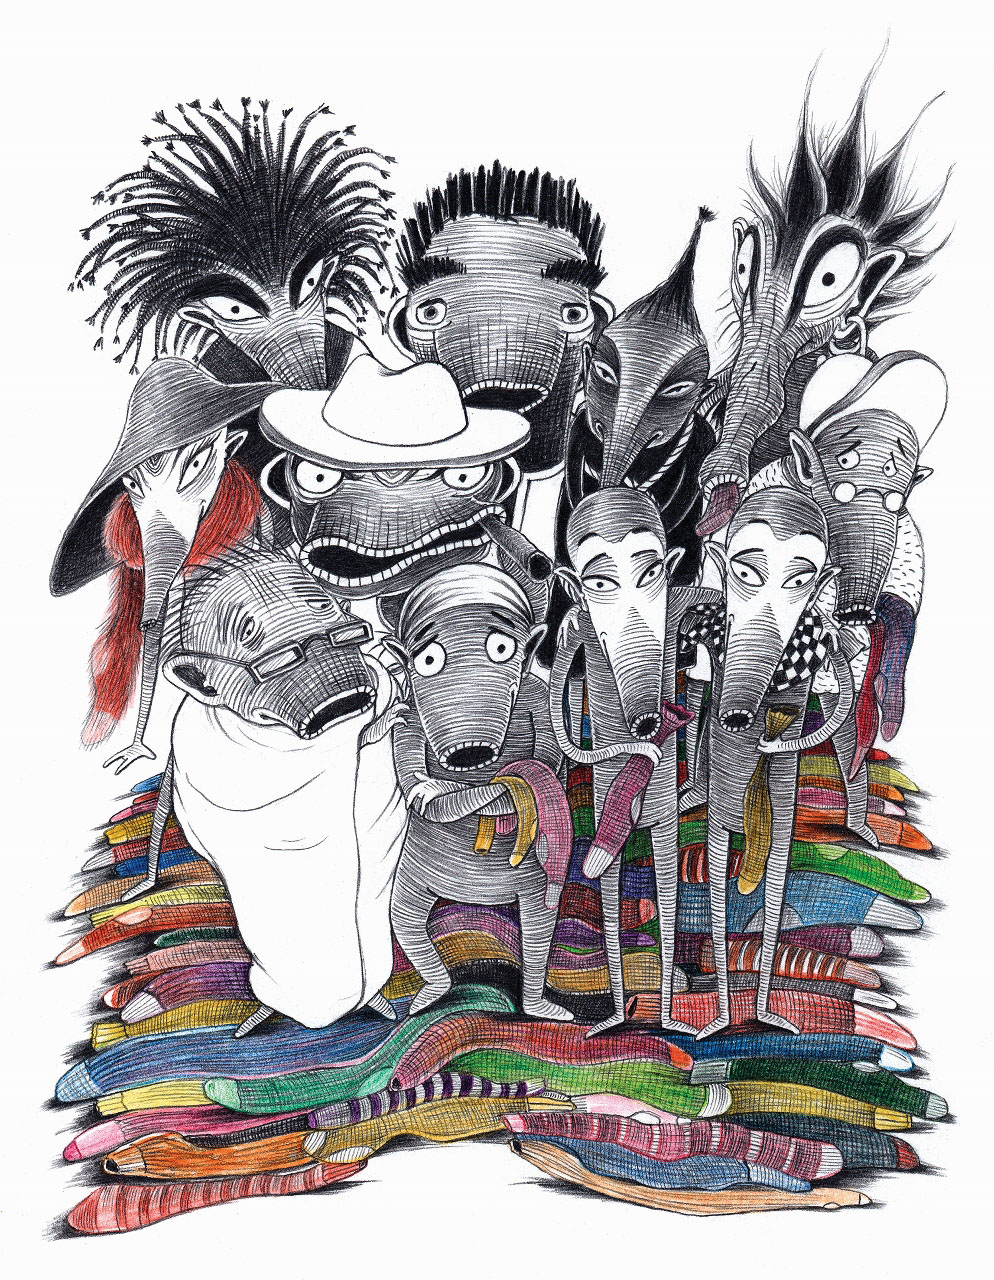 11 Svetu Vystava Detskych Ilustratoru Pamatnik Lidice